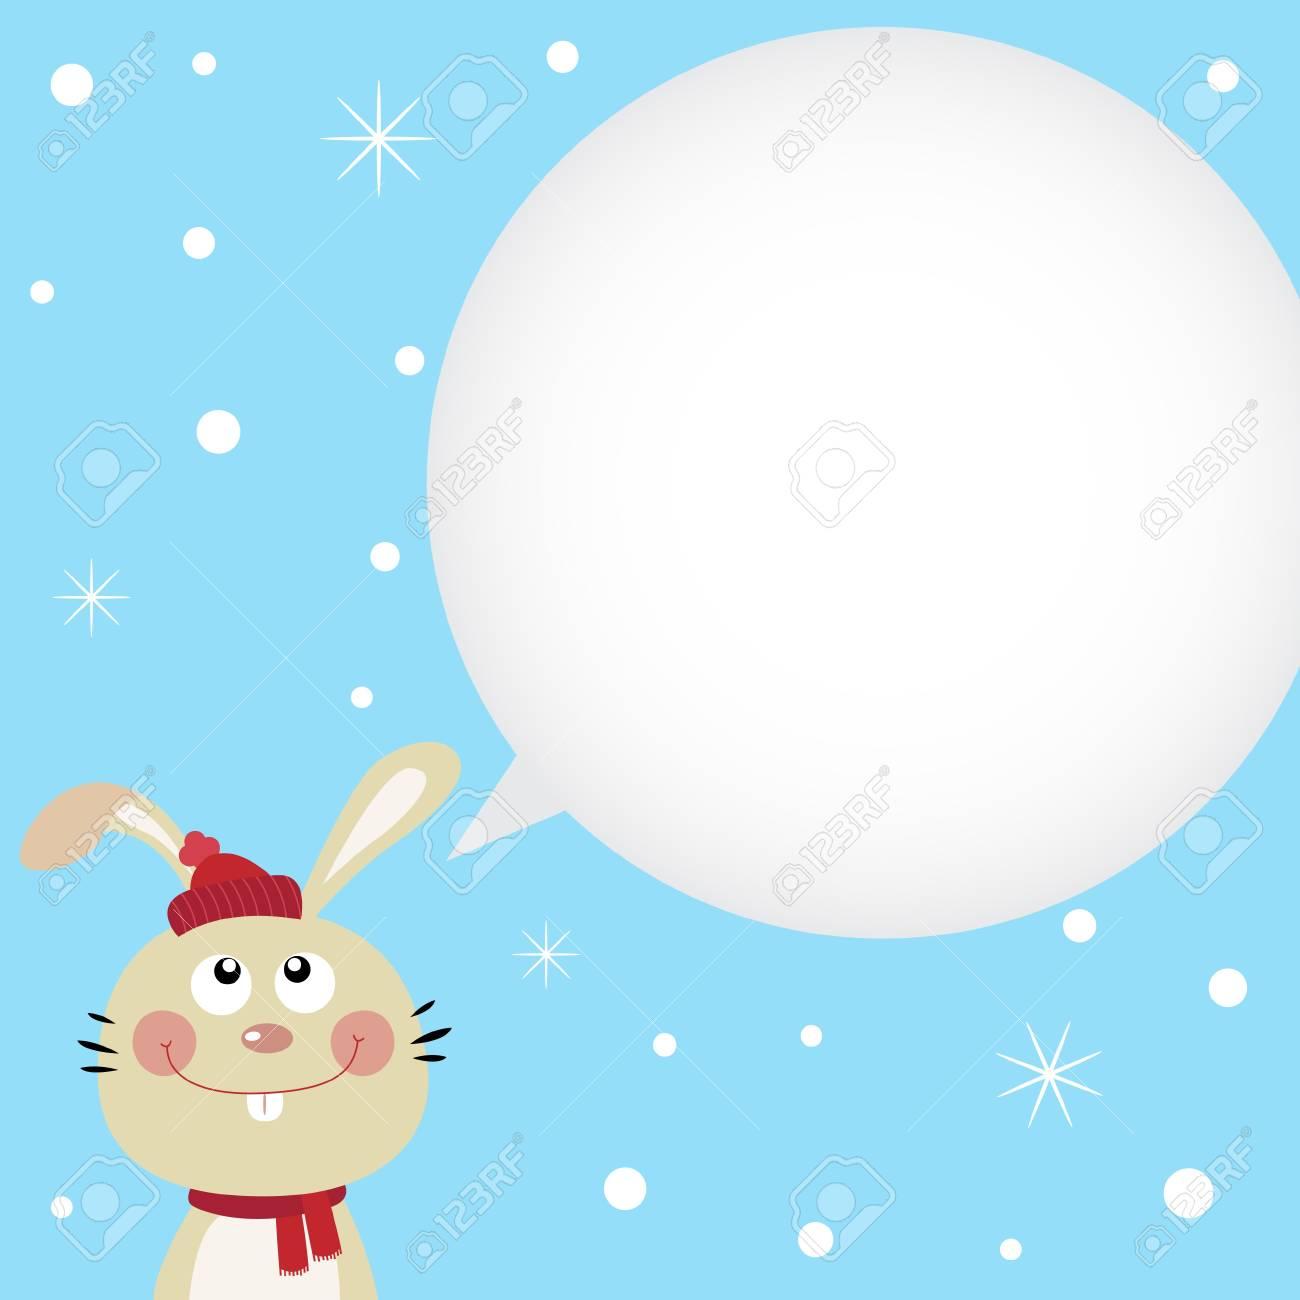 Christmas card with cute rabbit Stock Vector - 11313286